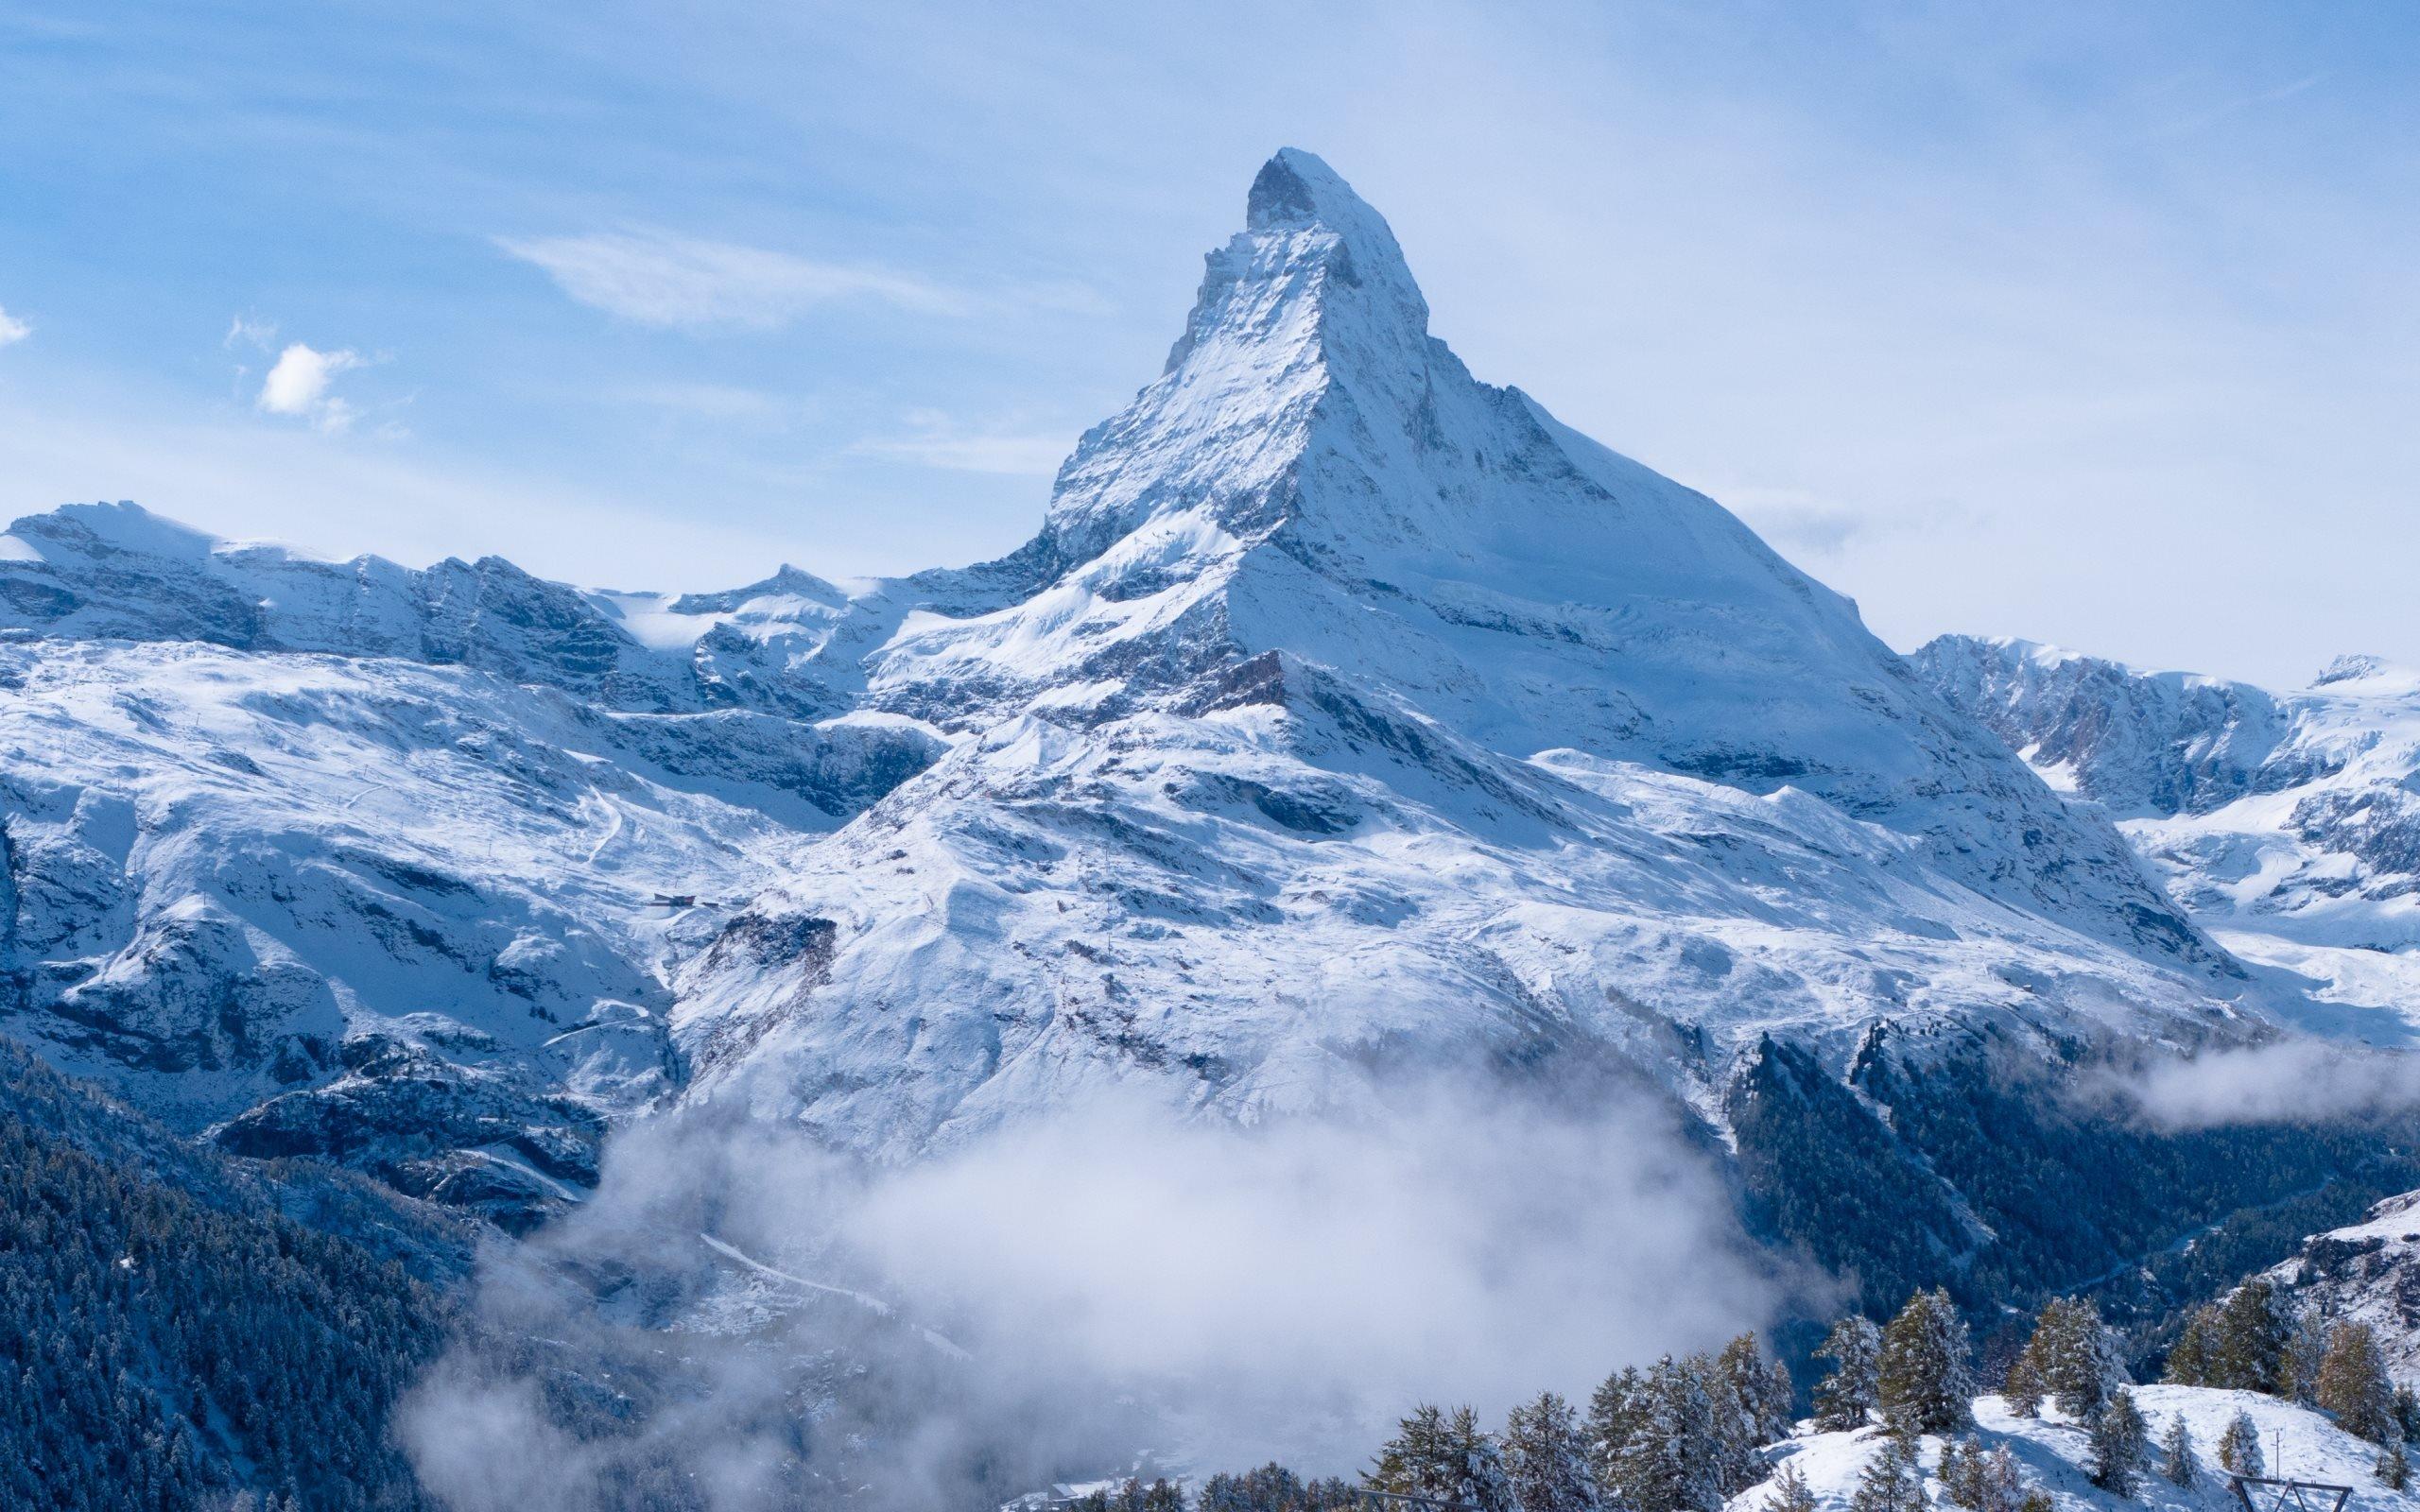 Swiss Alps Hd Wallpaper Wallpapersafari